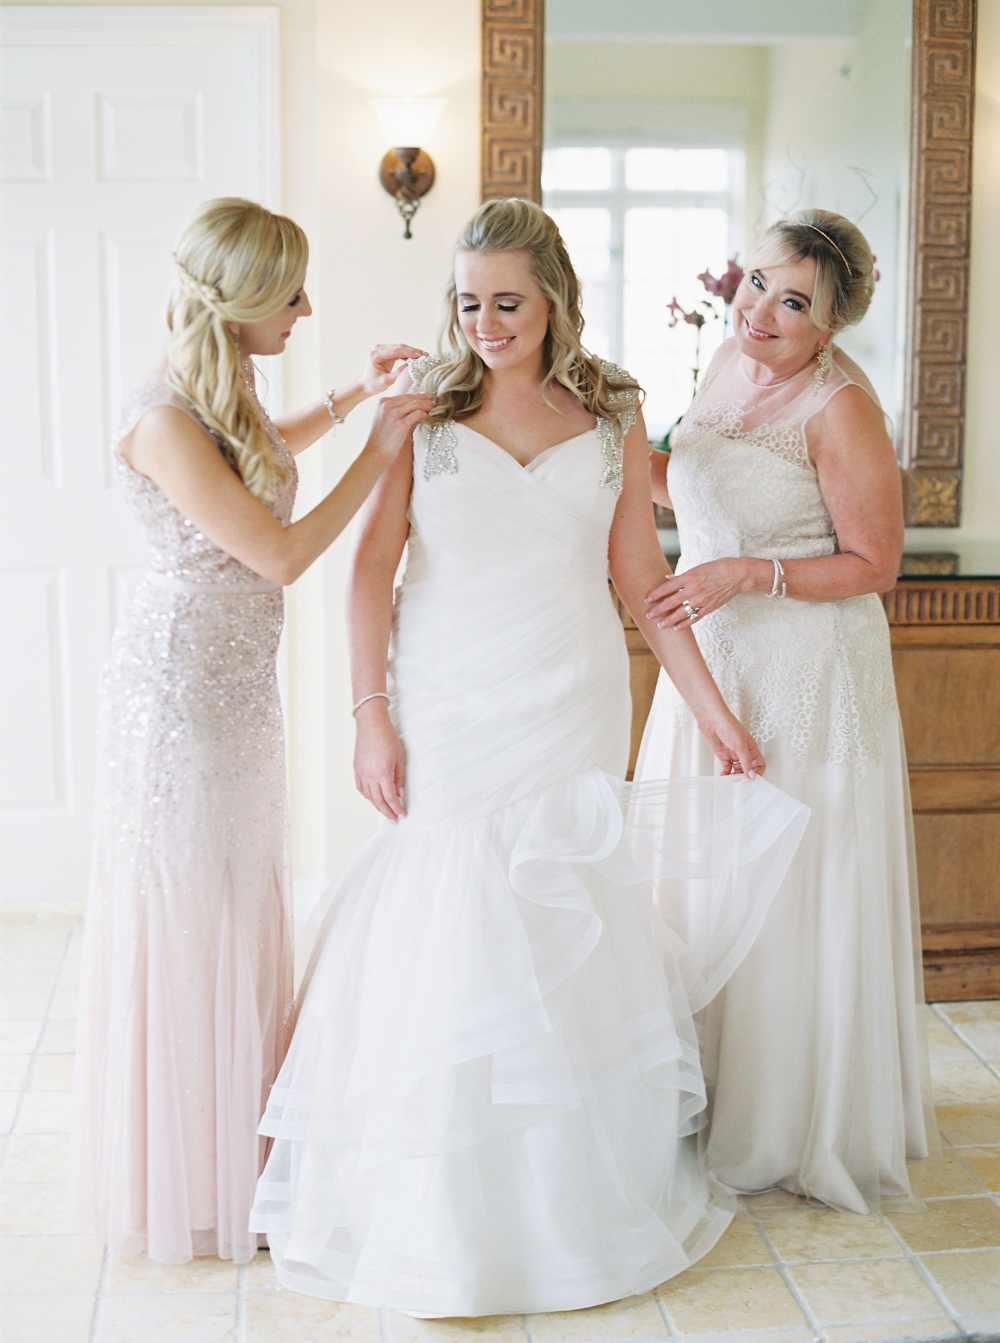 hayley-paige-emeryn-dress-fancy-things-wedding